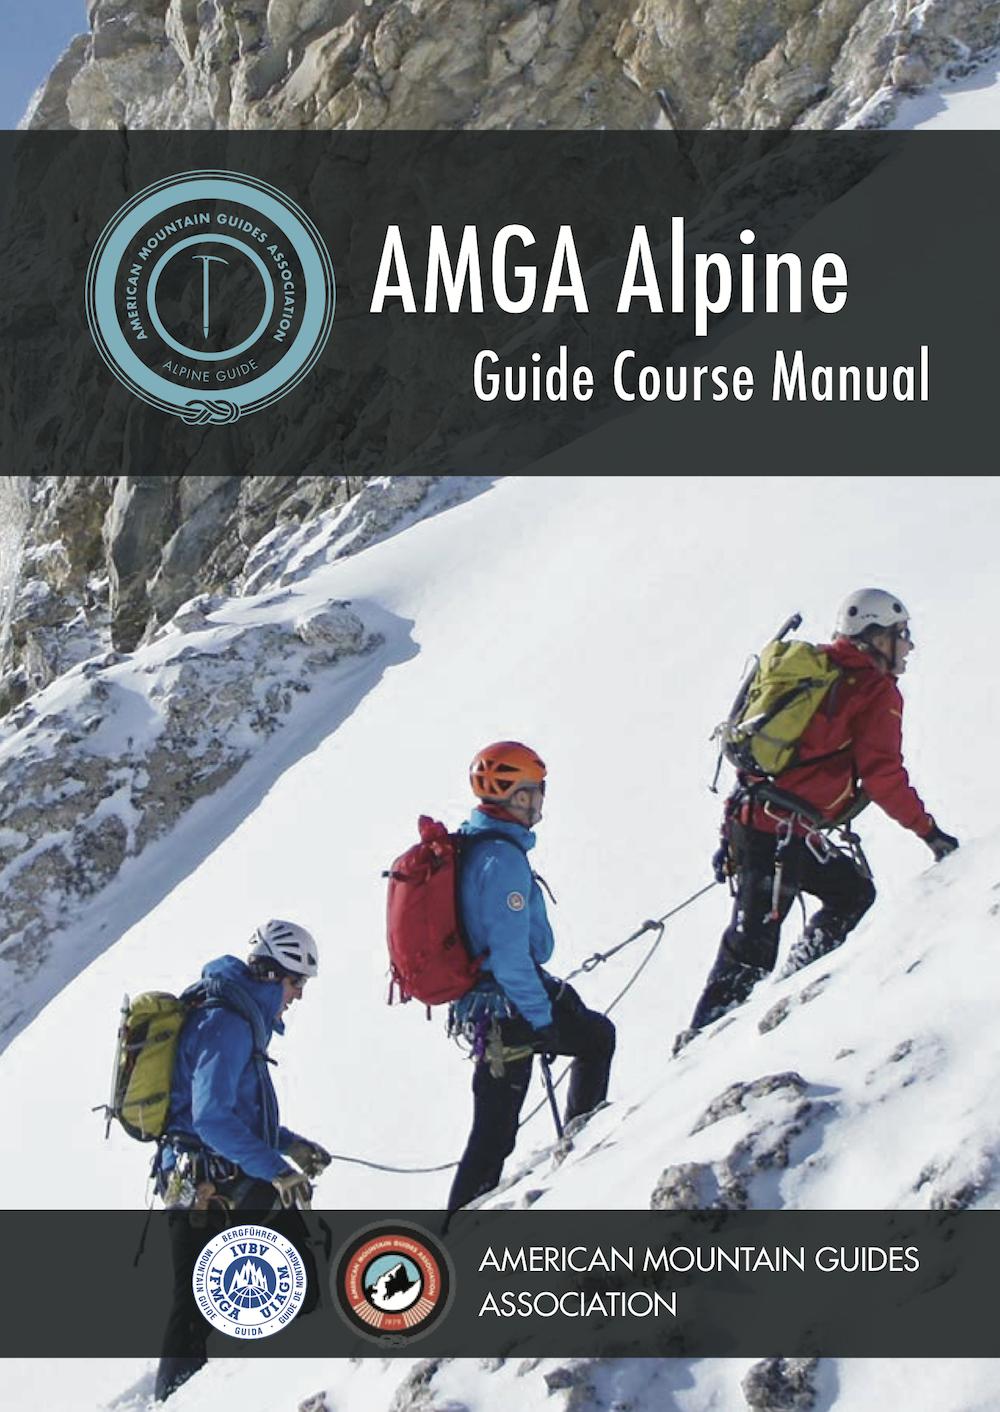 amga alpine guide course manual amga amga rh amga com American Medical Association Group amga mountain guide manual